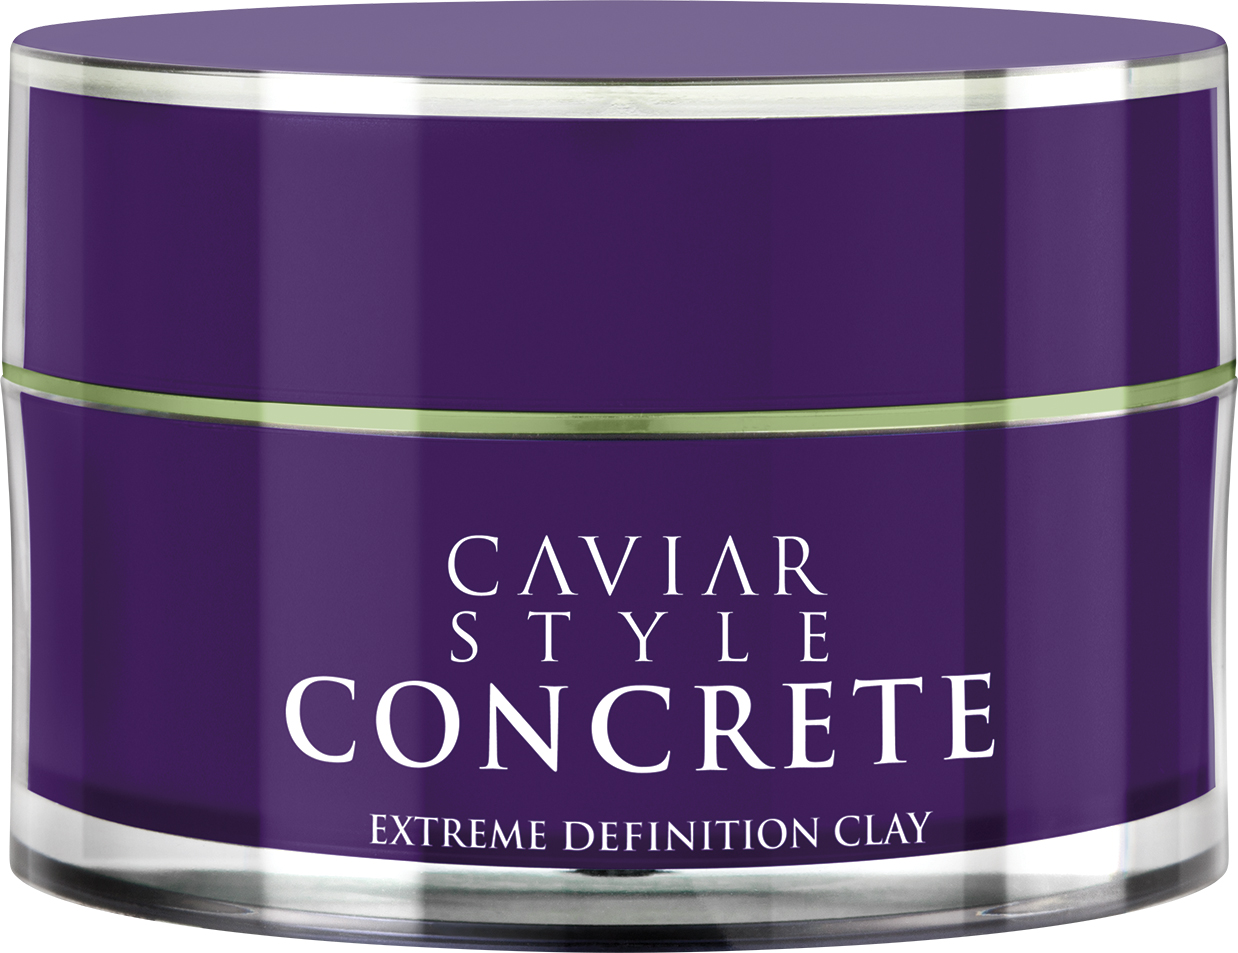 ALTERNA Глина дефинирующая для экстра-сильной фиксации / Style Concrete Extreme Definition Clay CAVIAR 52 мл от Галерея Косметики